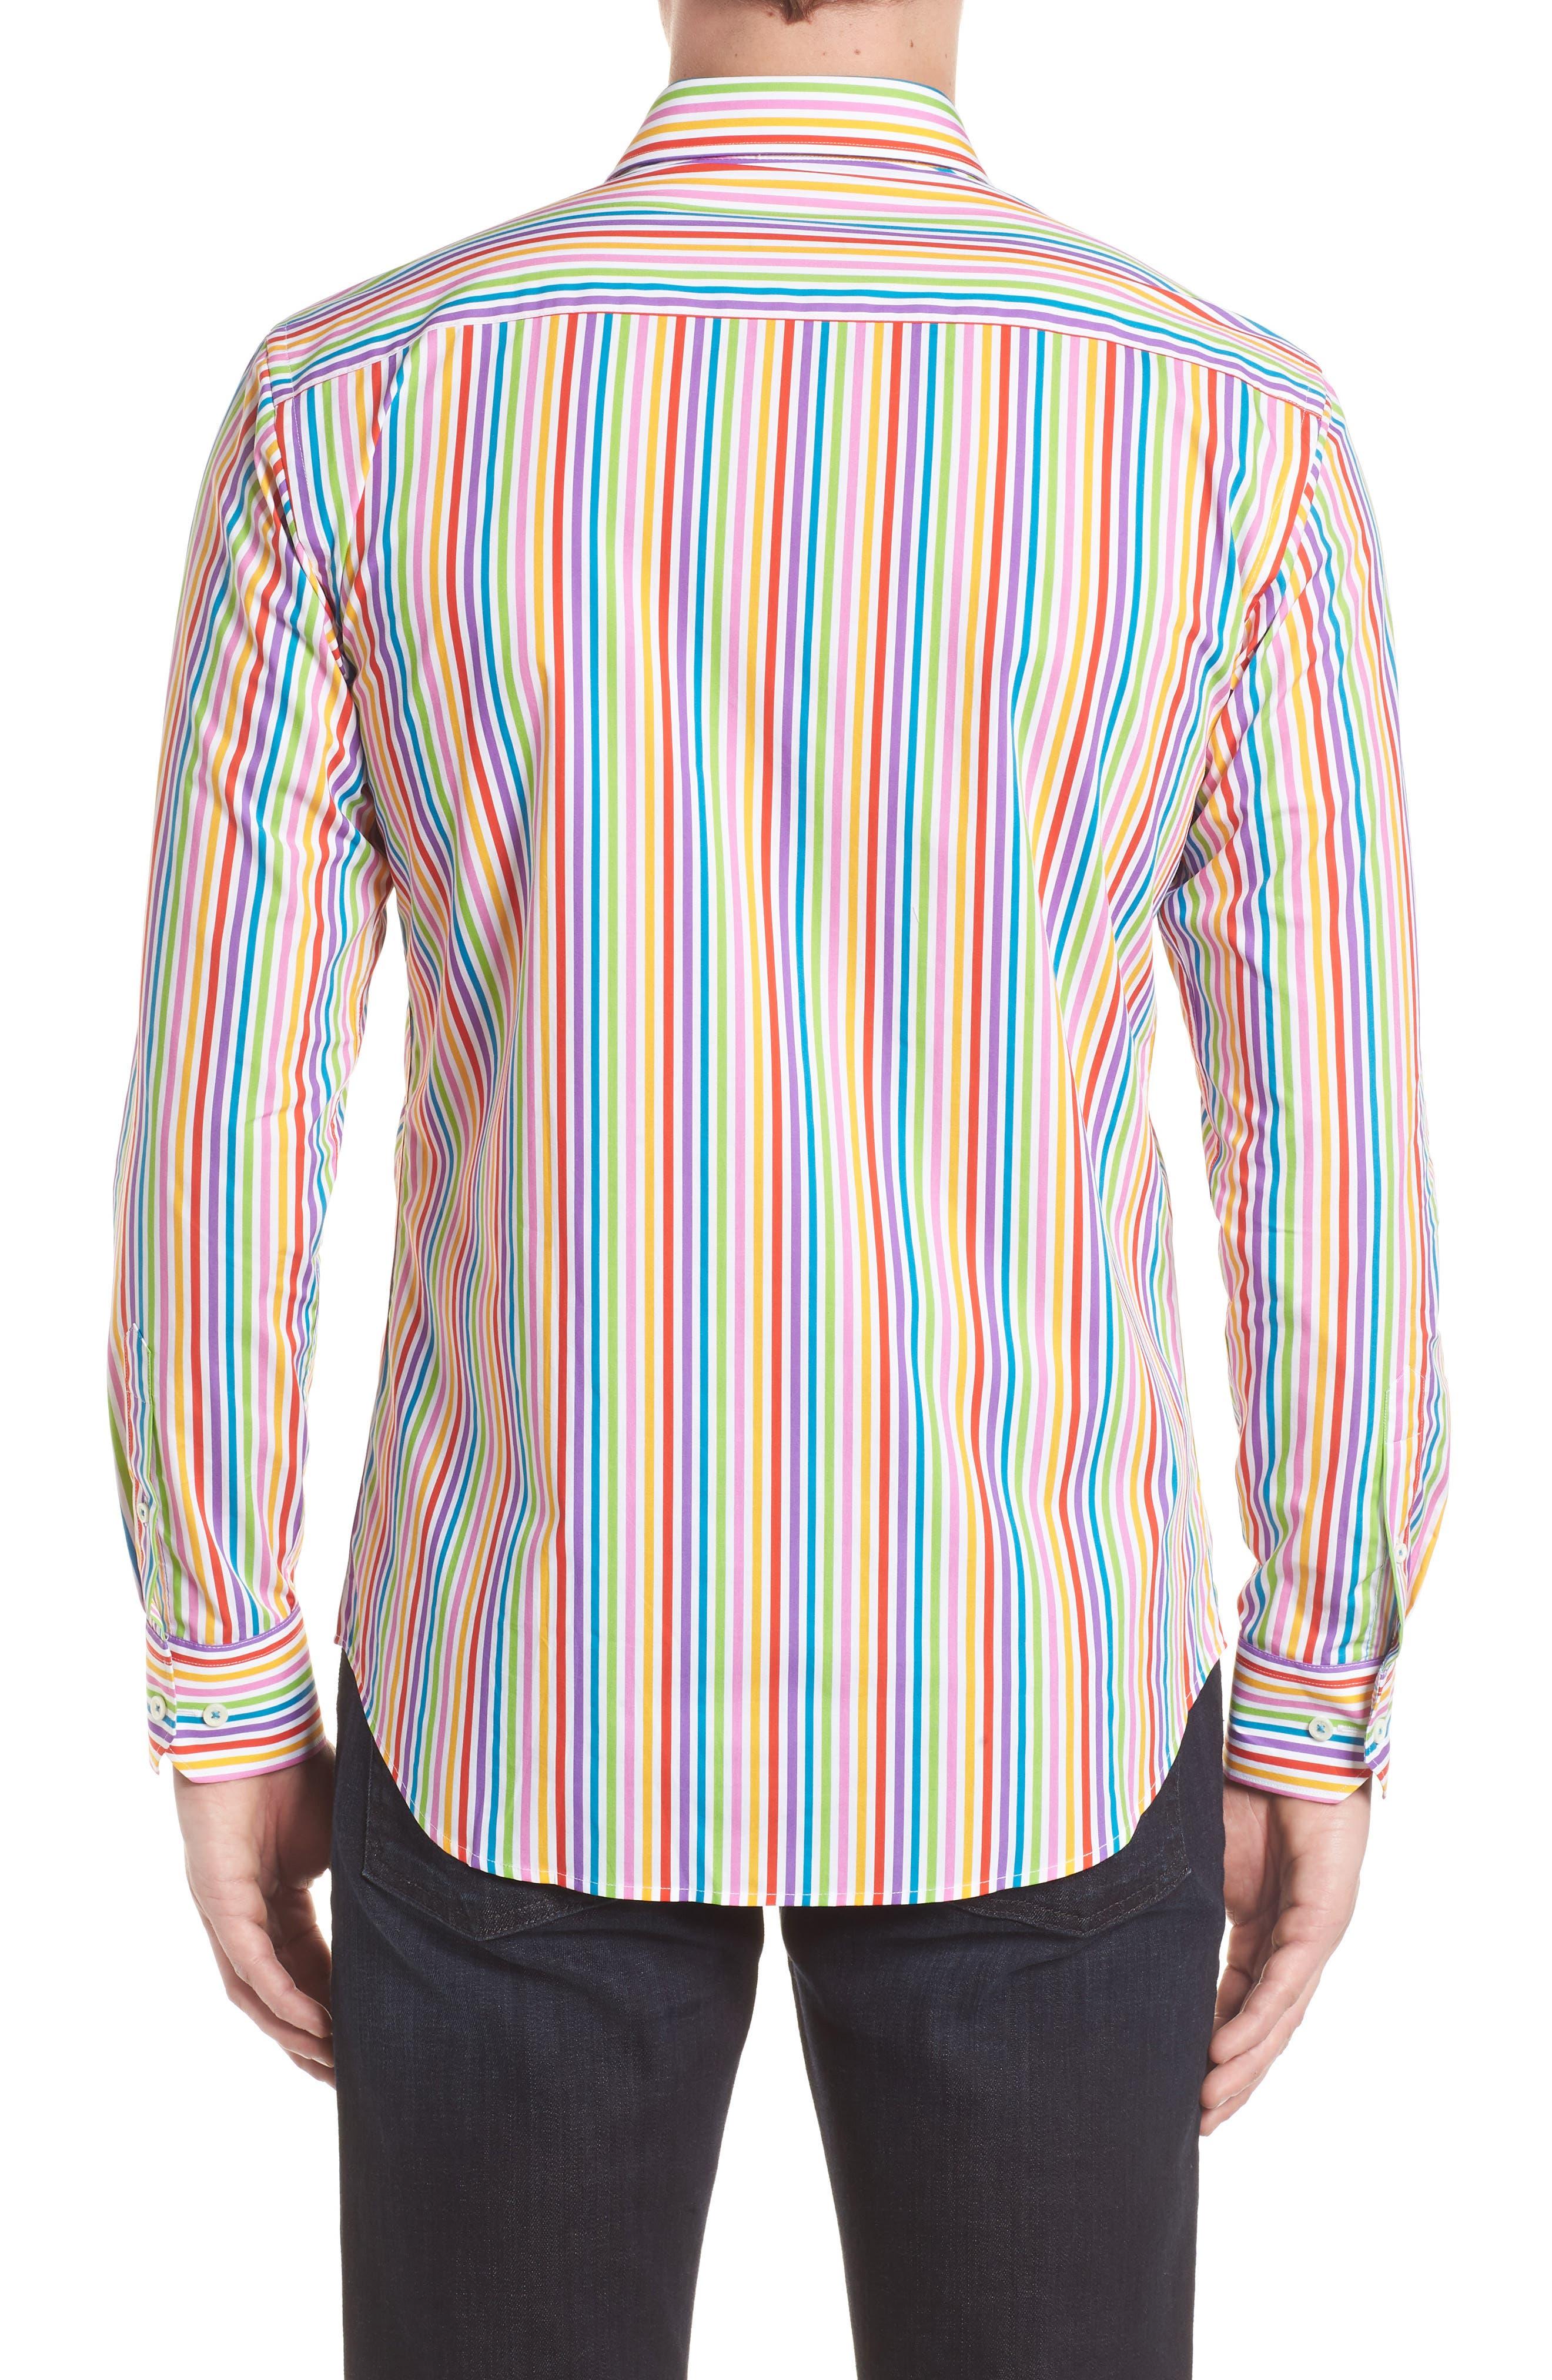 BUGATCHI,                             Classic Fit Woven Sport Shirt,                             Alternate thumbnail 2, color,                             601